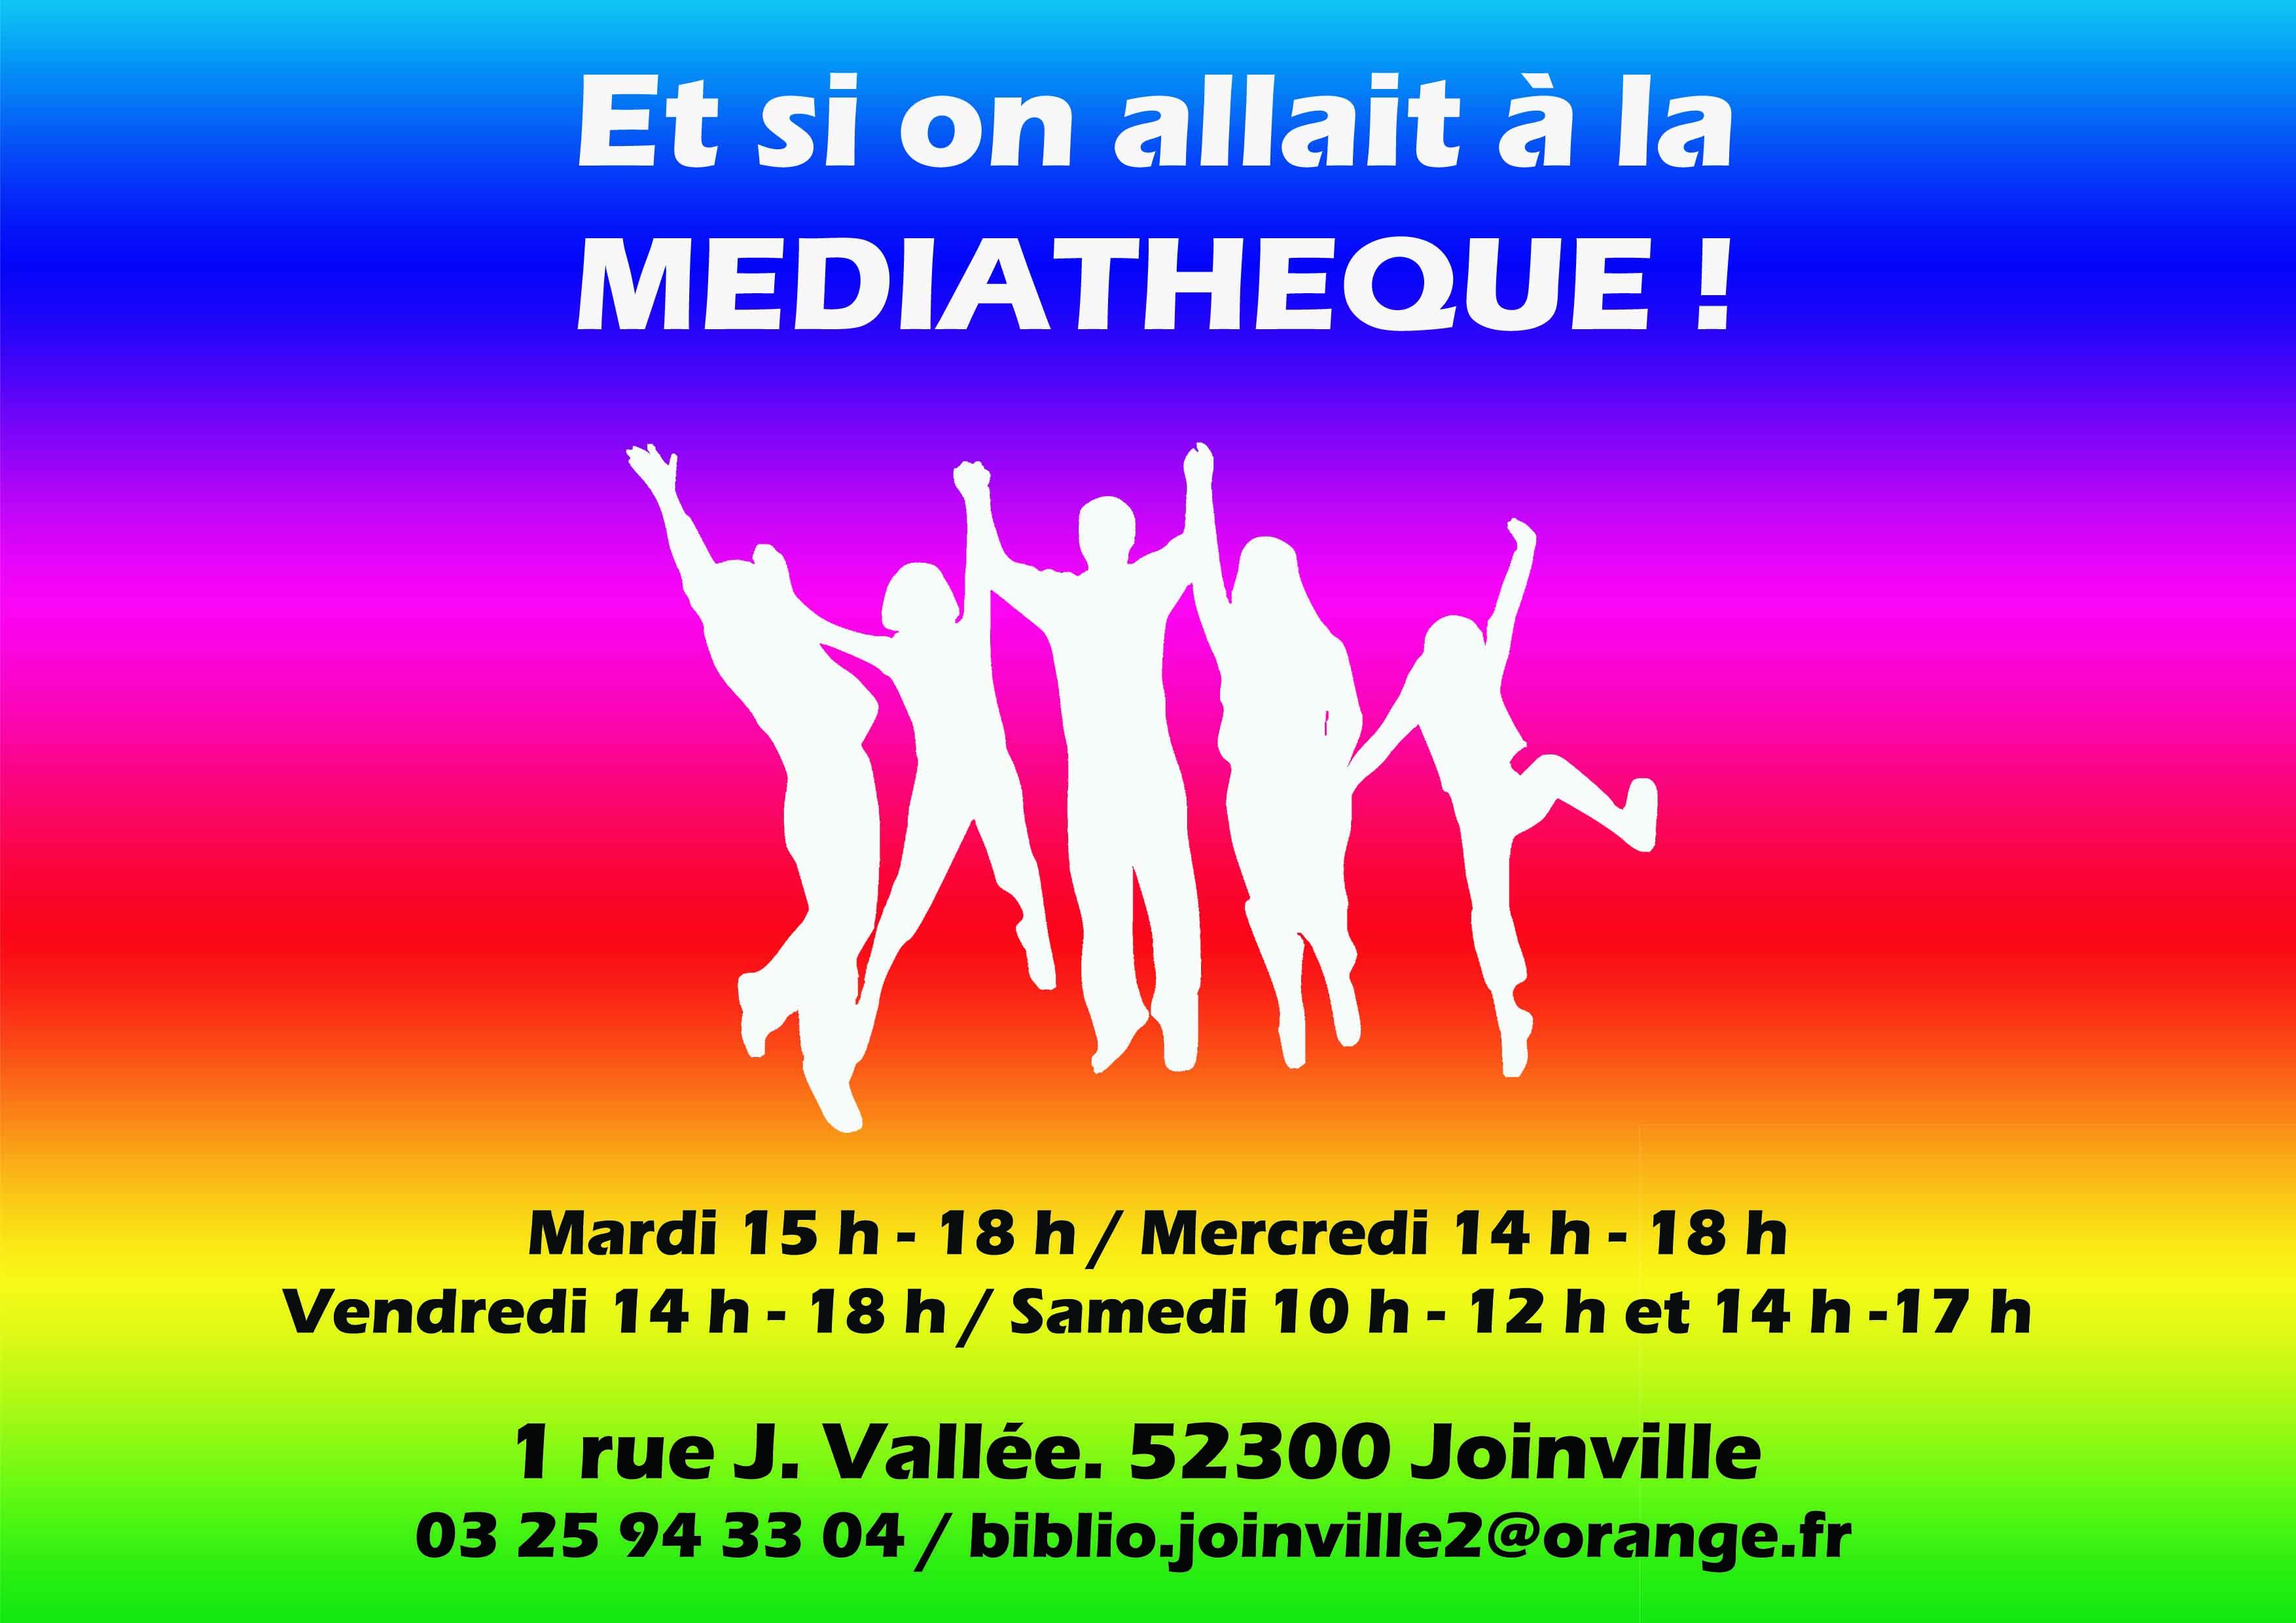 mediatheque.jpg